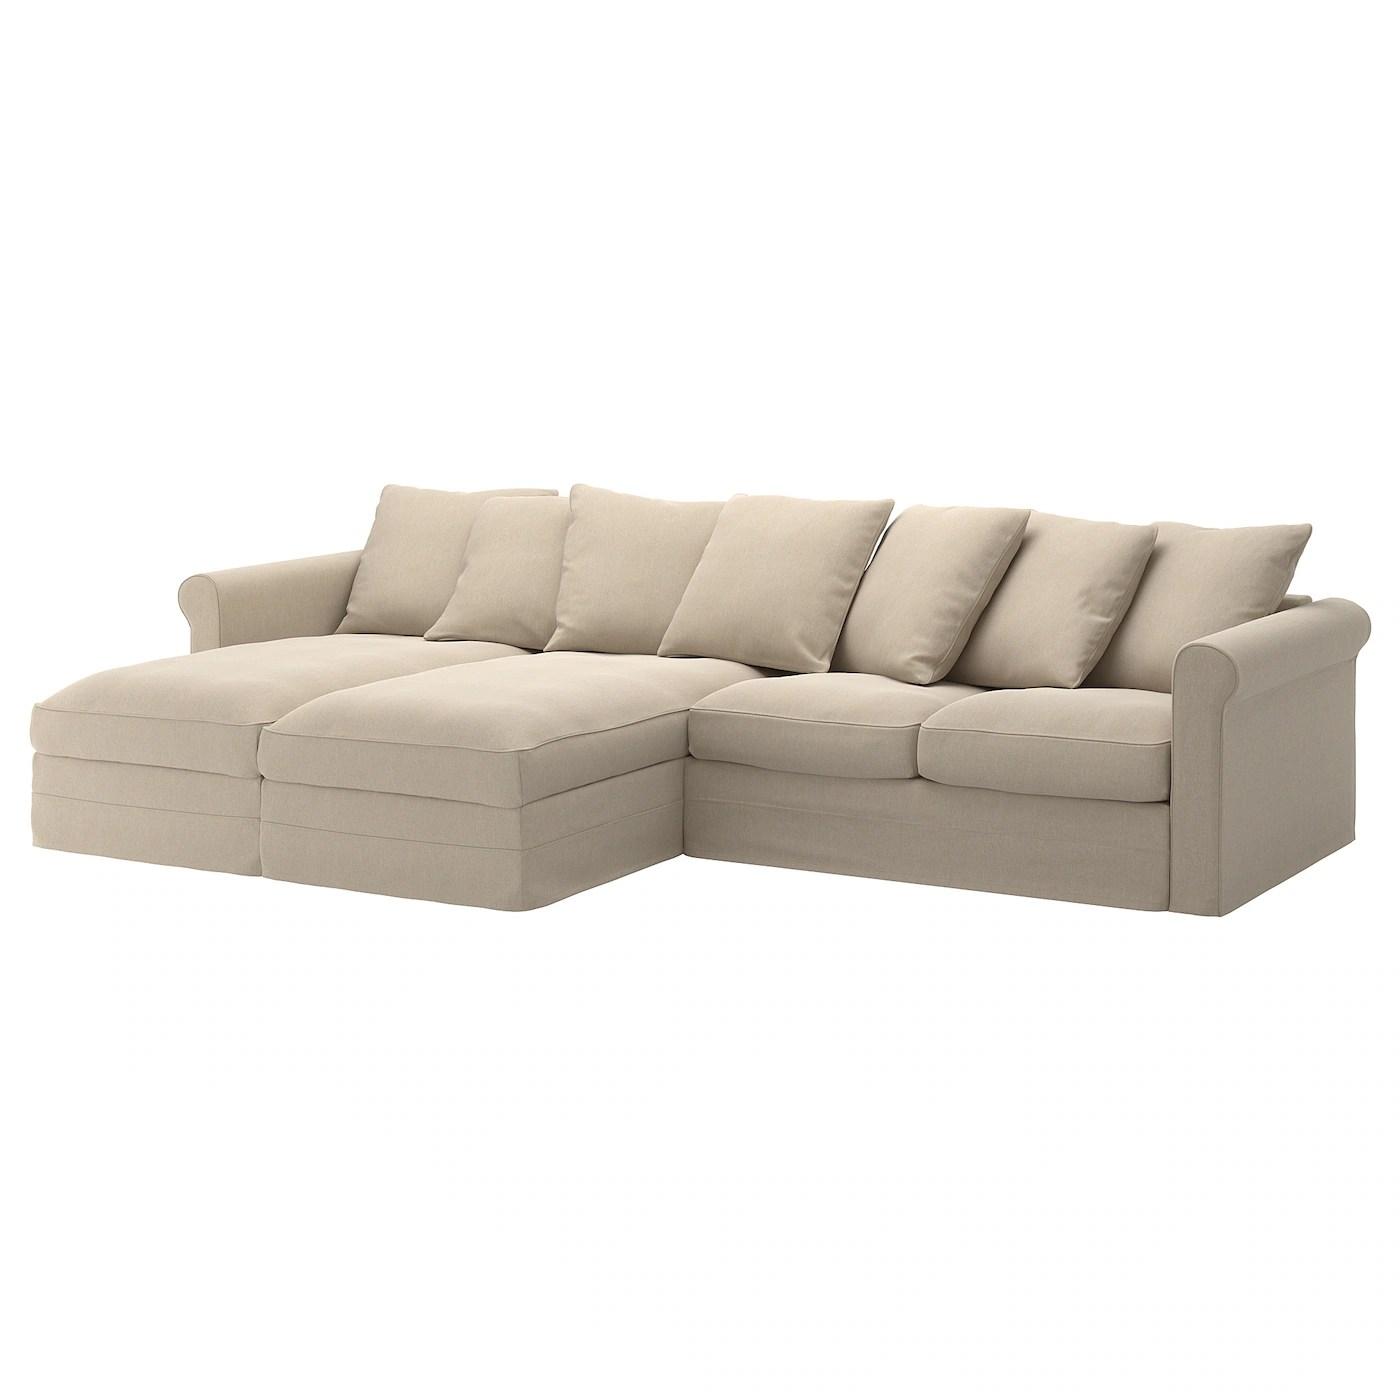 best thing to clean cream leather sofa kids sleeper 4 seater ikea vimle corner seat gräsbo black